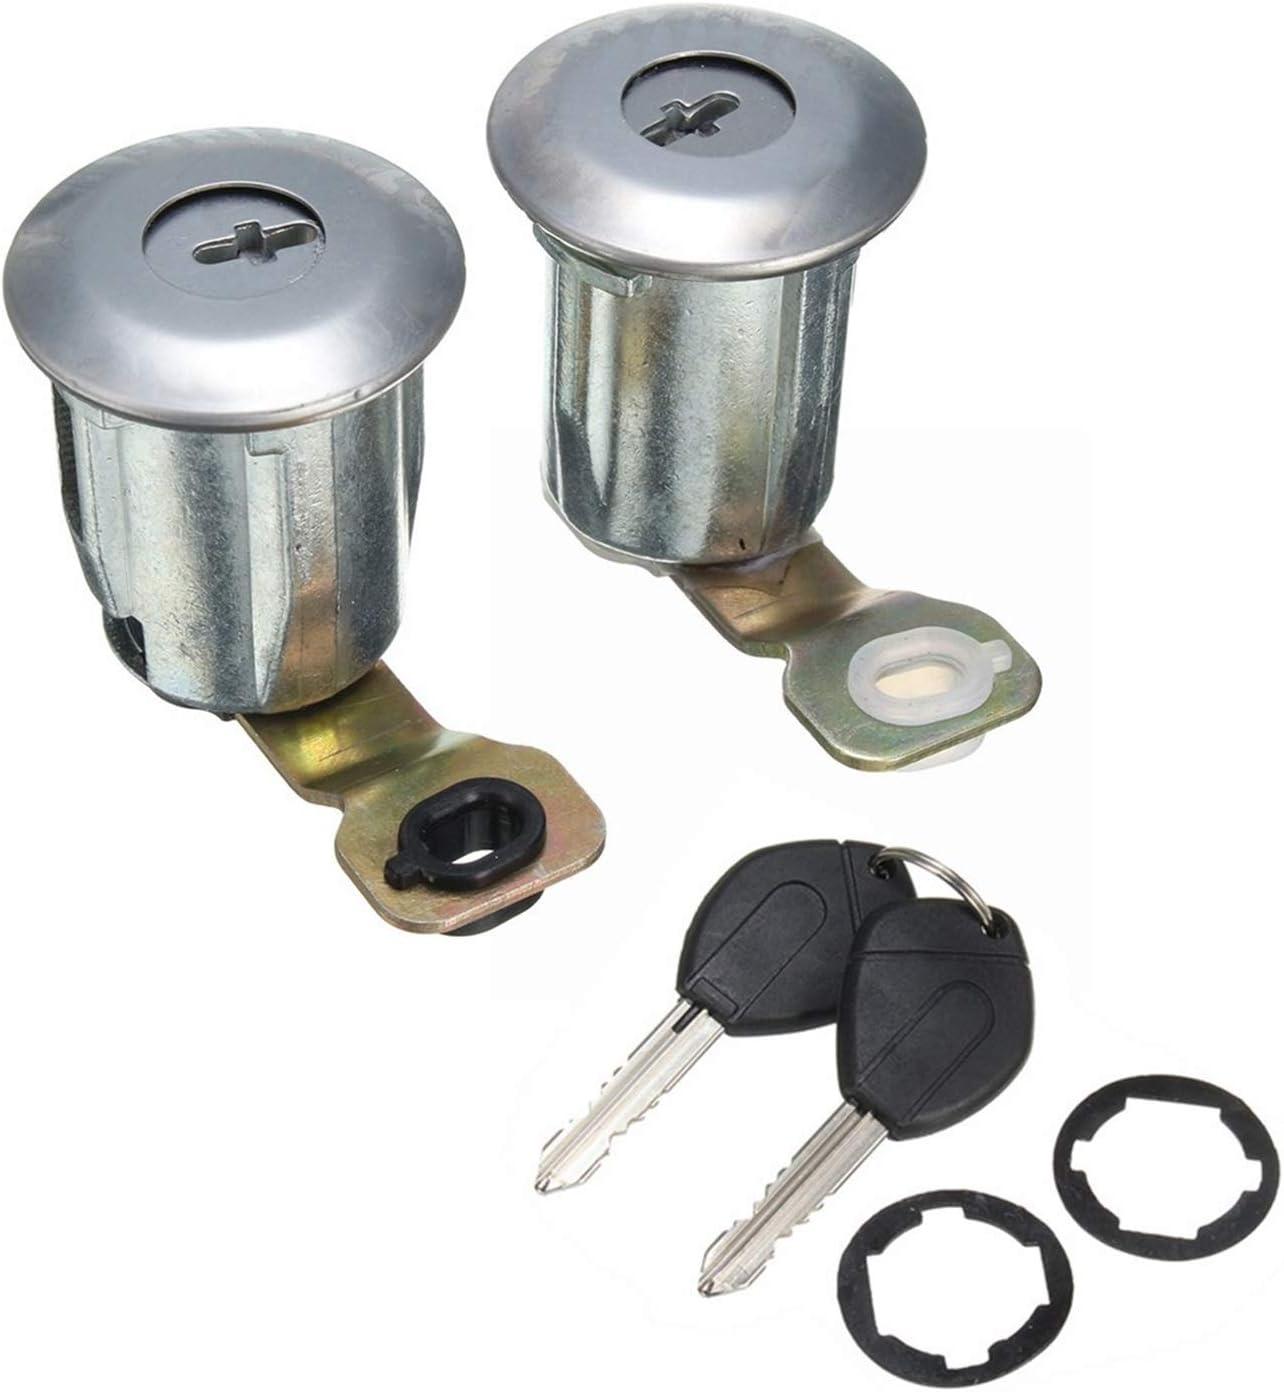 Flowing CHENZHEN 1 Set 100% quality warranty Barrel Lock Key Fi Car In stock Door Locks